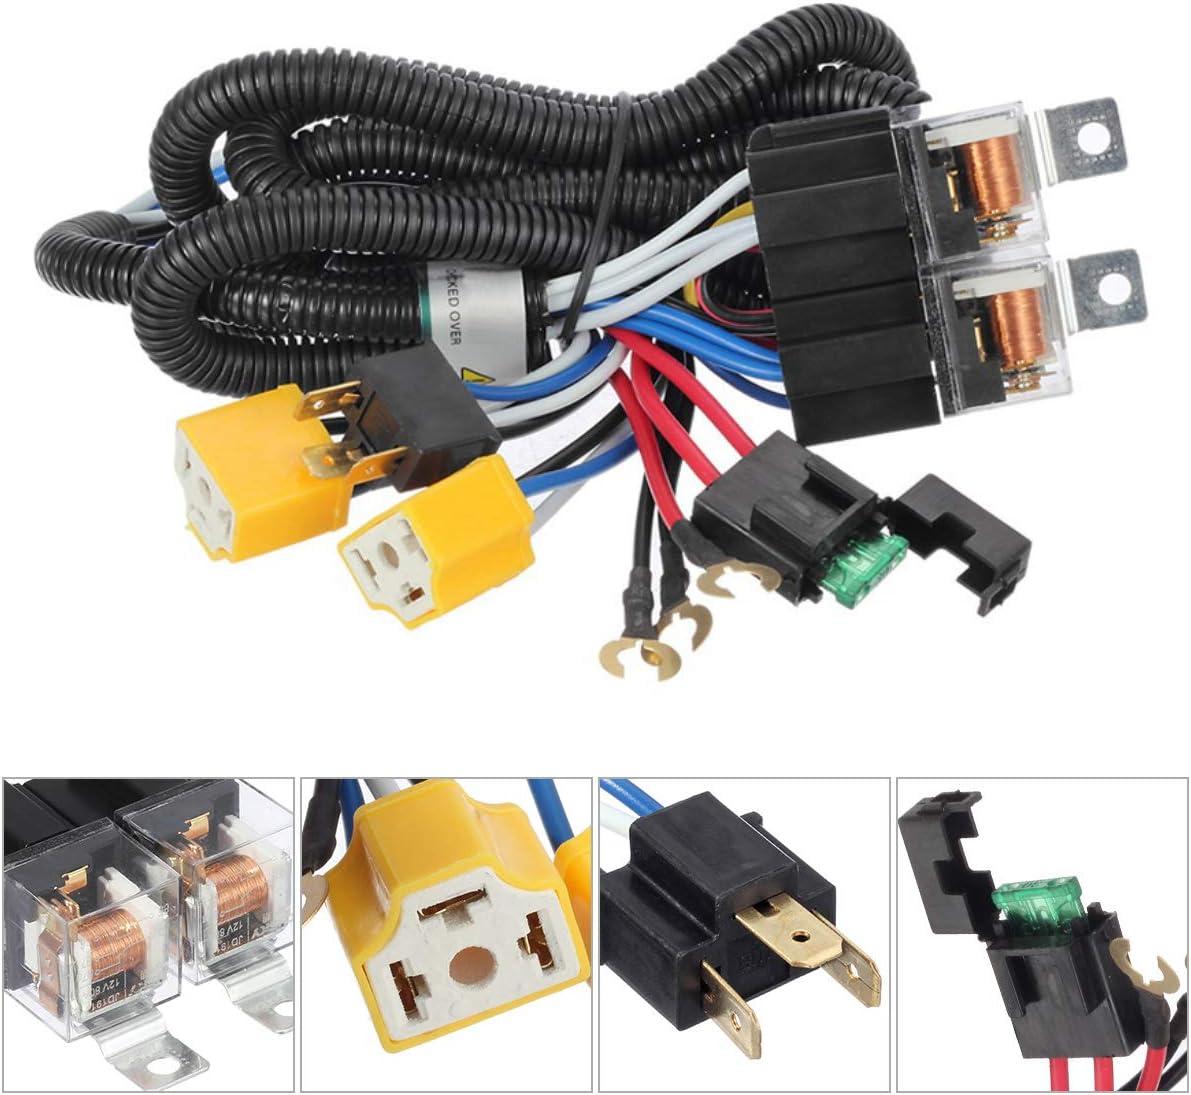 Partsam H4 9003 Headlight Relay Wiring Harness Kit High Low Beam Heat on h15 wiring harness, c3 wiring harness, b2 wiring harness, drl wiring harness, hr wiring harness, h7 wiring harness, g9 wiring harness, h11 wiring harness, ipf wiring harness, h8 wiring harness, h22 wiring harness, s13 wiring harness, f1 wiring harness, h3 wiring harness, h2 wiring harness, e2 wiring harness, t3 wiring harness, h13 wiring harness, h1 wiring harness,